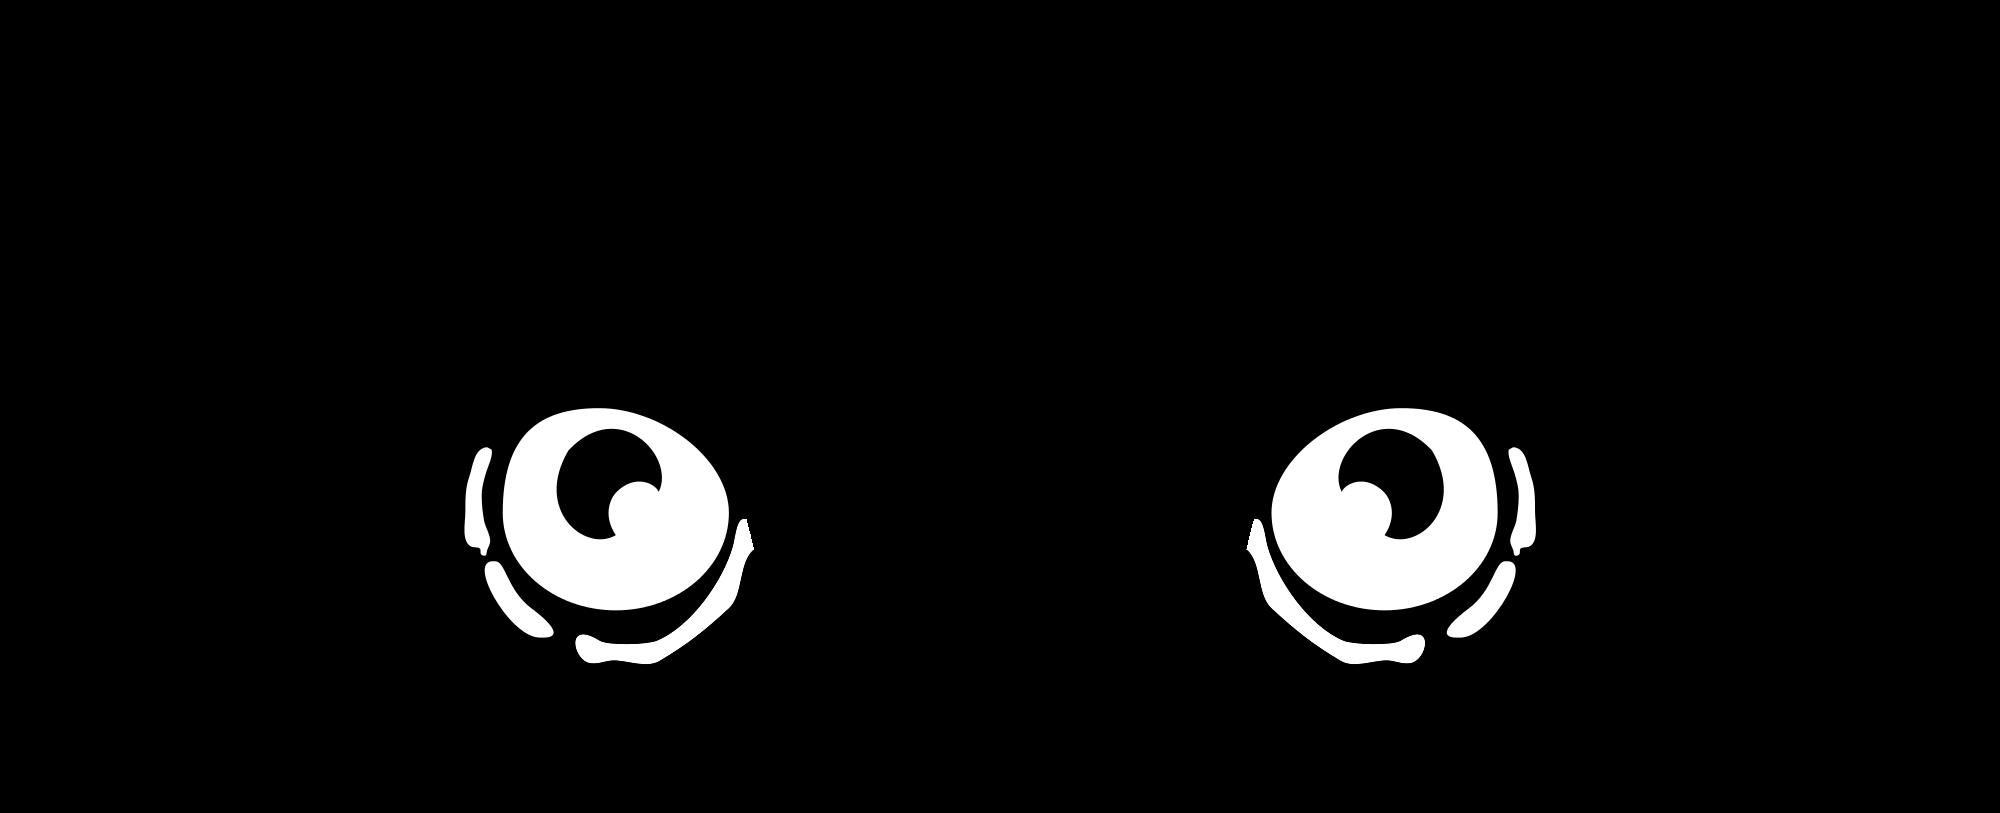 2000x813 Filetiger Eye Vector.svg